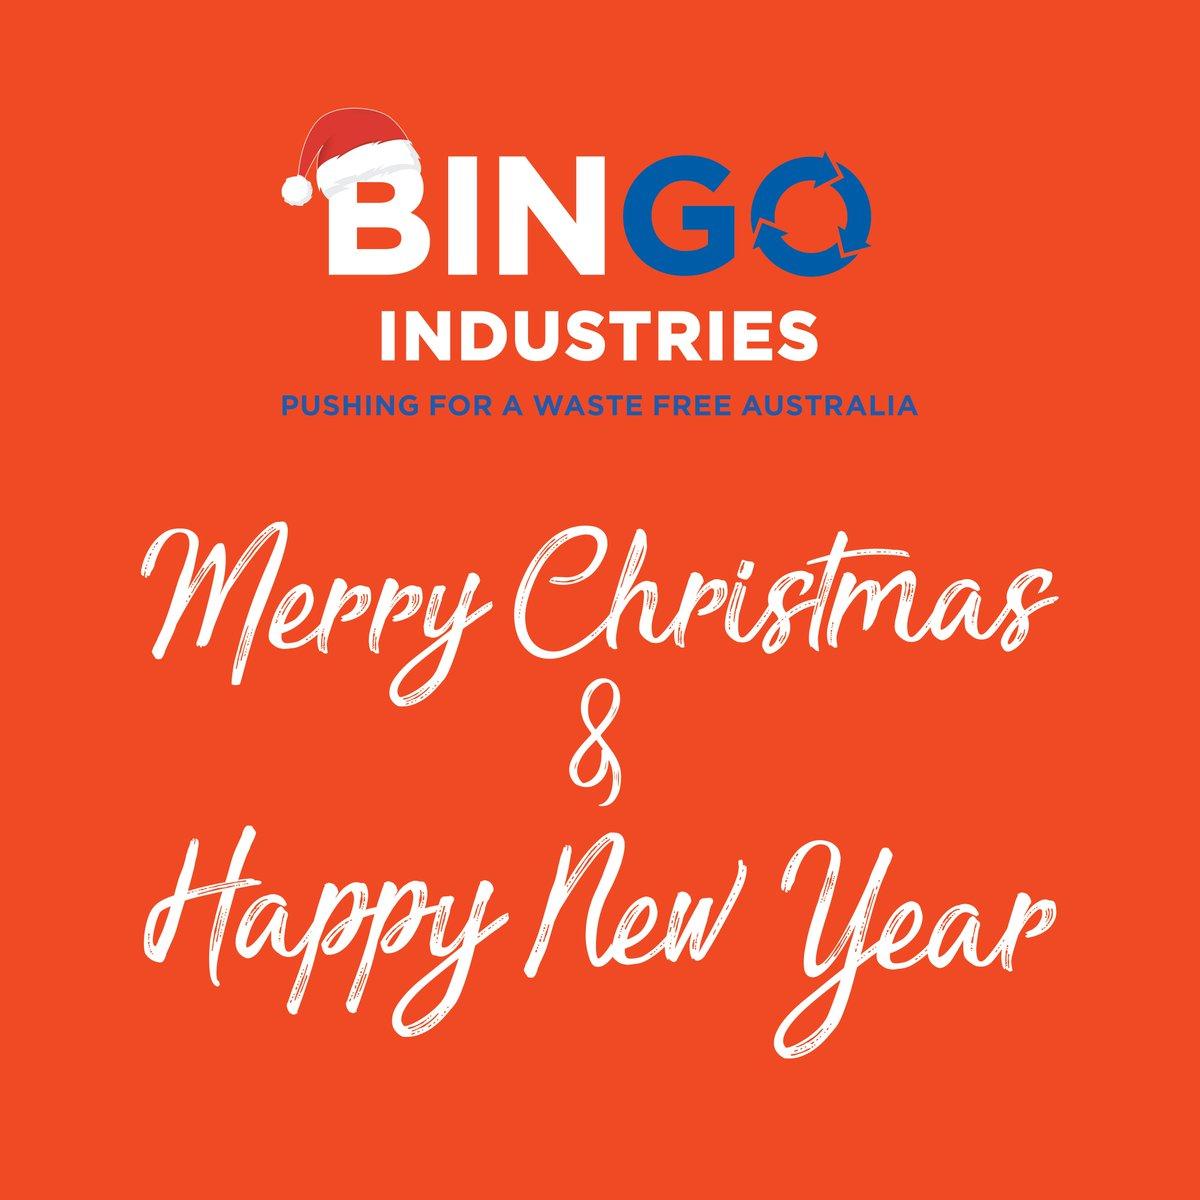 Připojte bingo